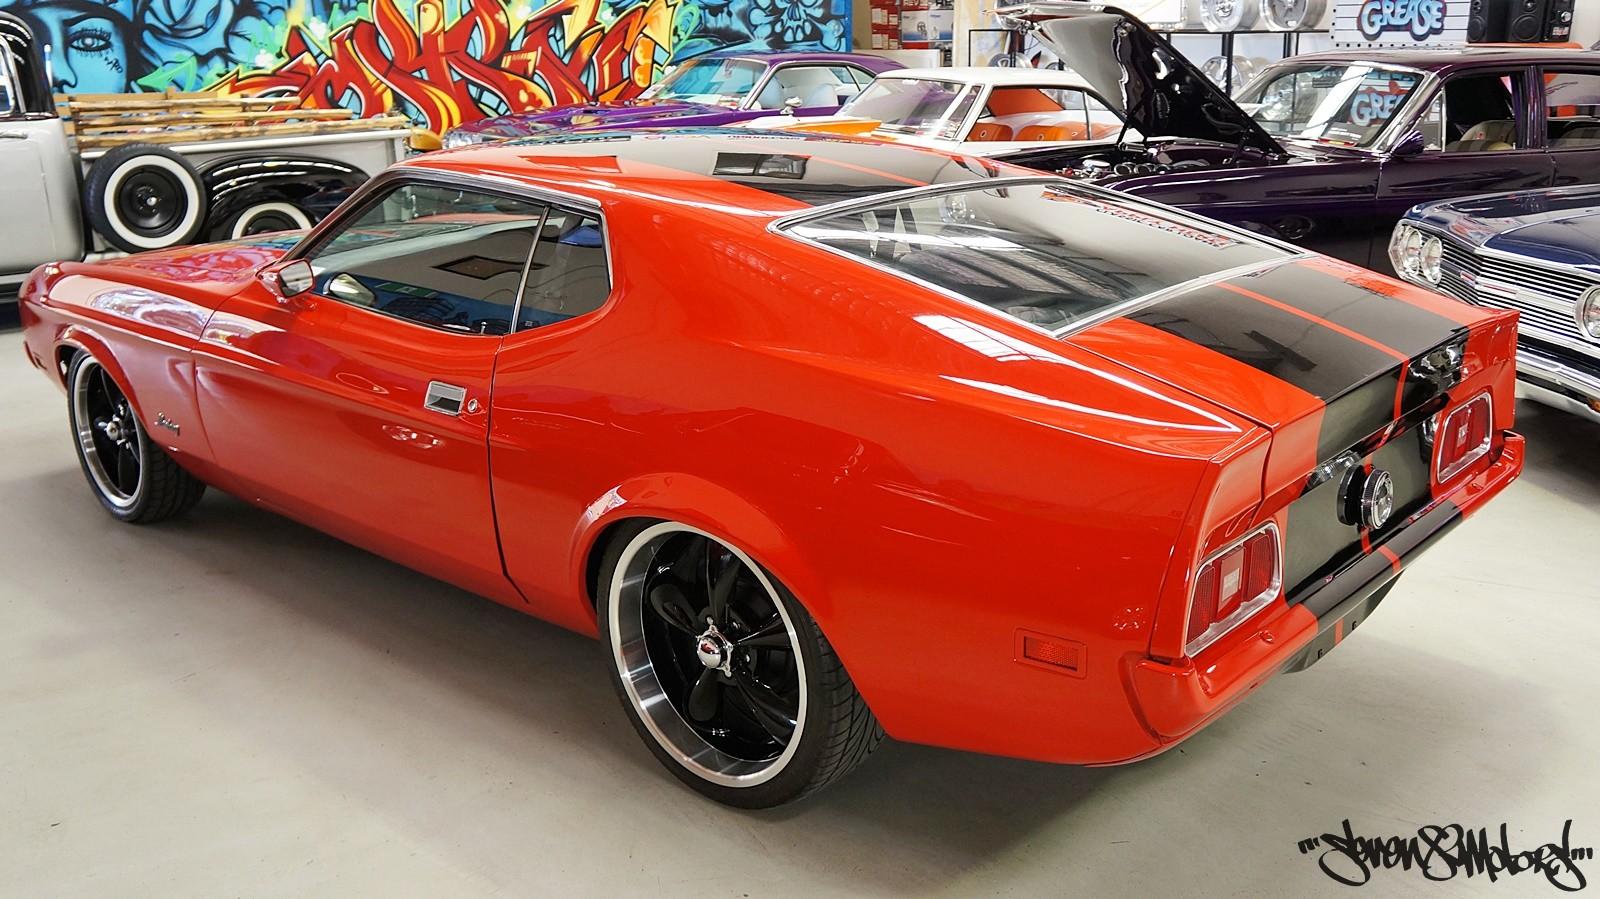 1971 Mustang Fastback SEVEN82MOTORS